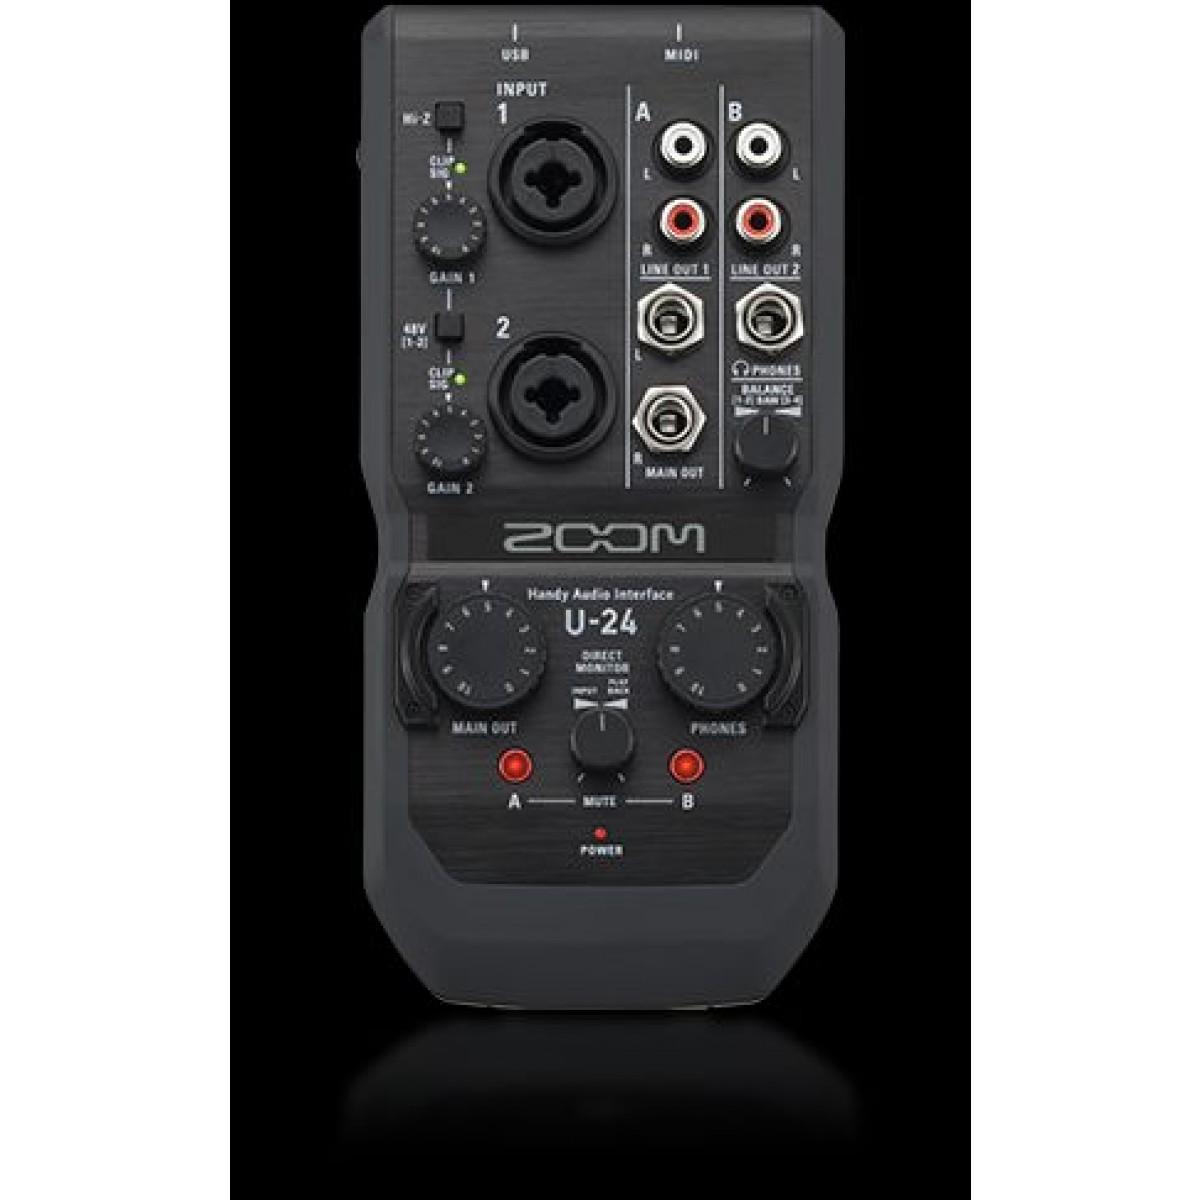 zoom u 24 portable handy audio interface. Black Bedroom Furniture Sets. Home Design Ideas